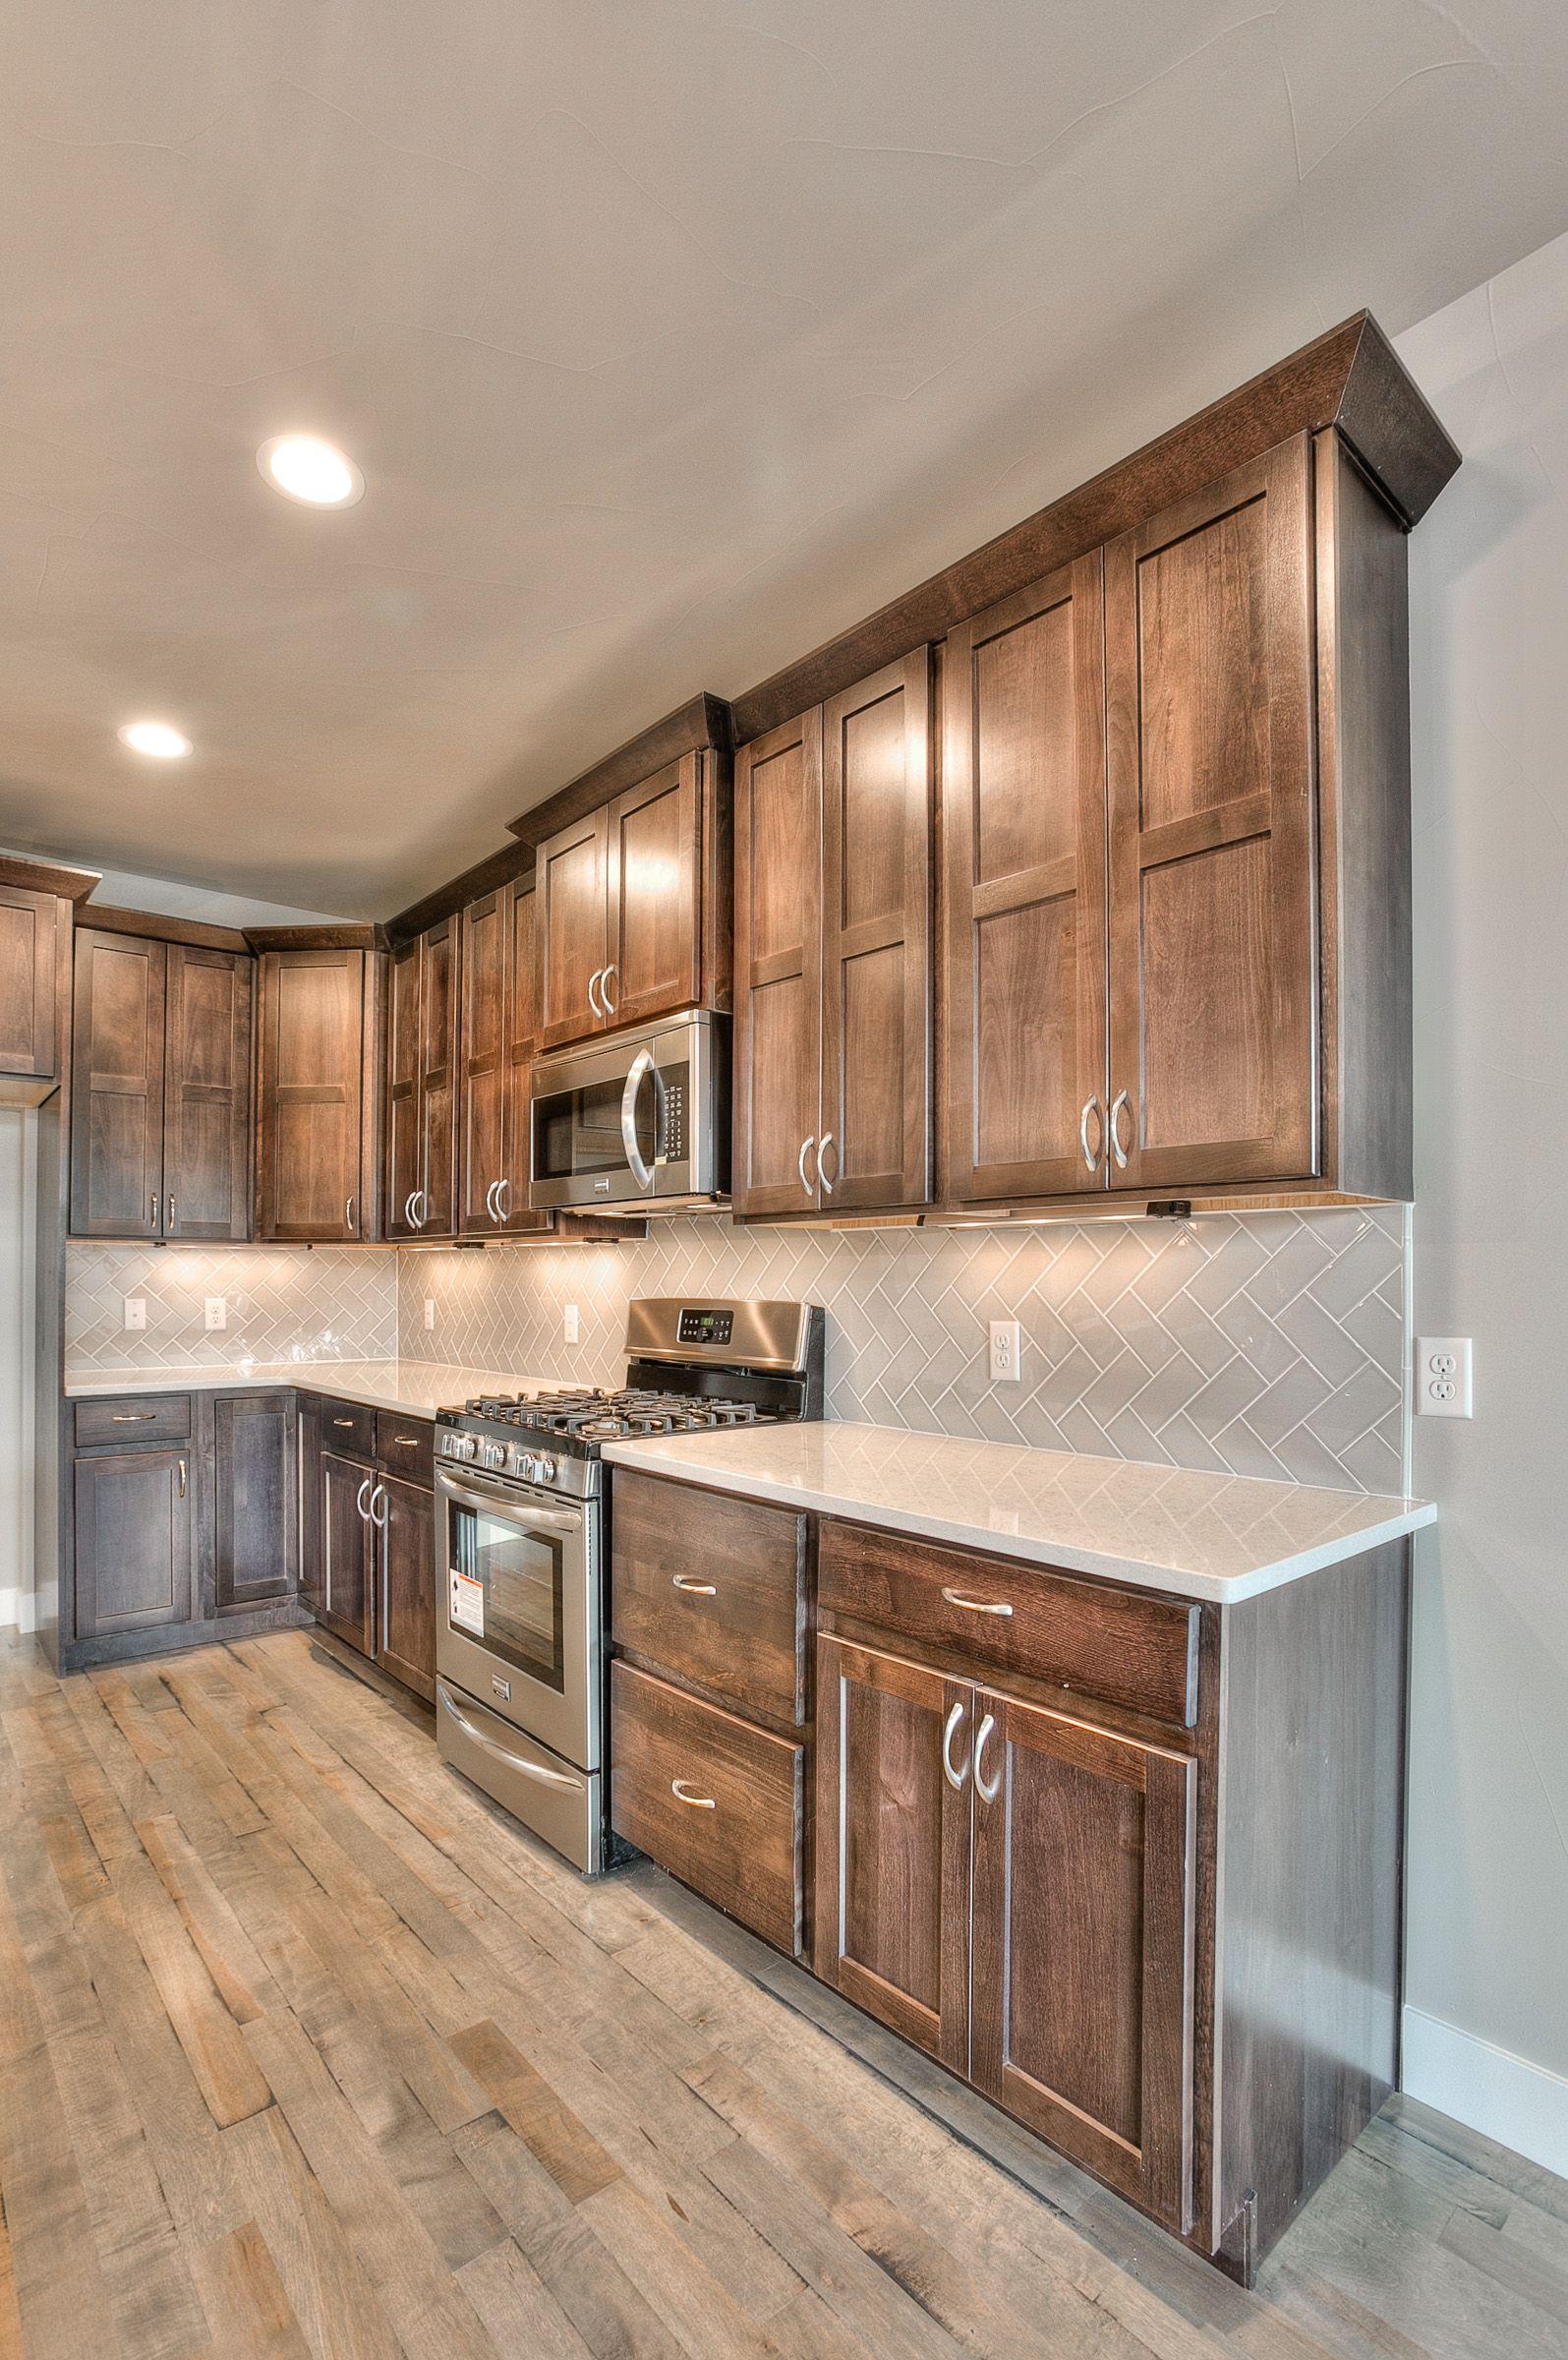 Kitchen Bathrooms Alder Graphite Shaker Cabinets Herringbone Backsplash In Grey To Tie In Concrete Flo Rustic Kitchen Rustic Kitchen Design Kitchen Remodel